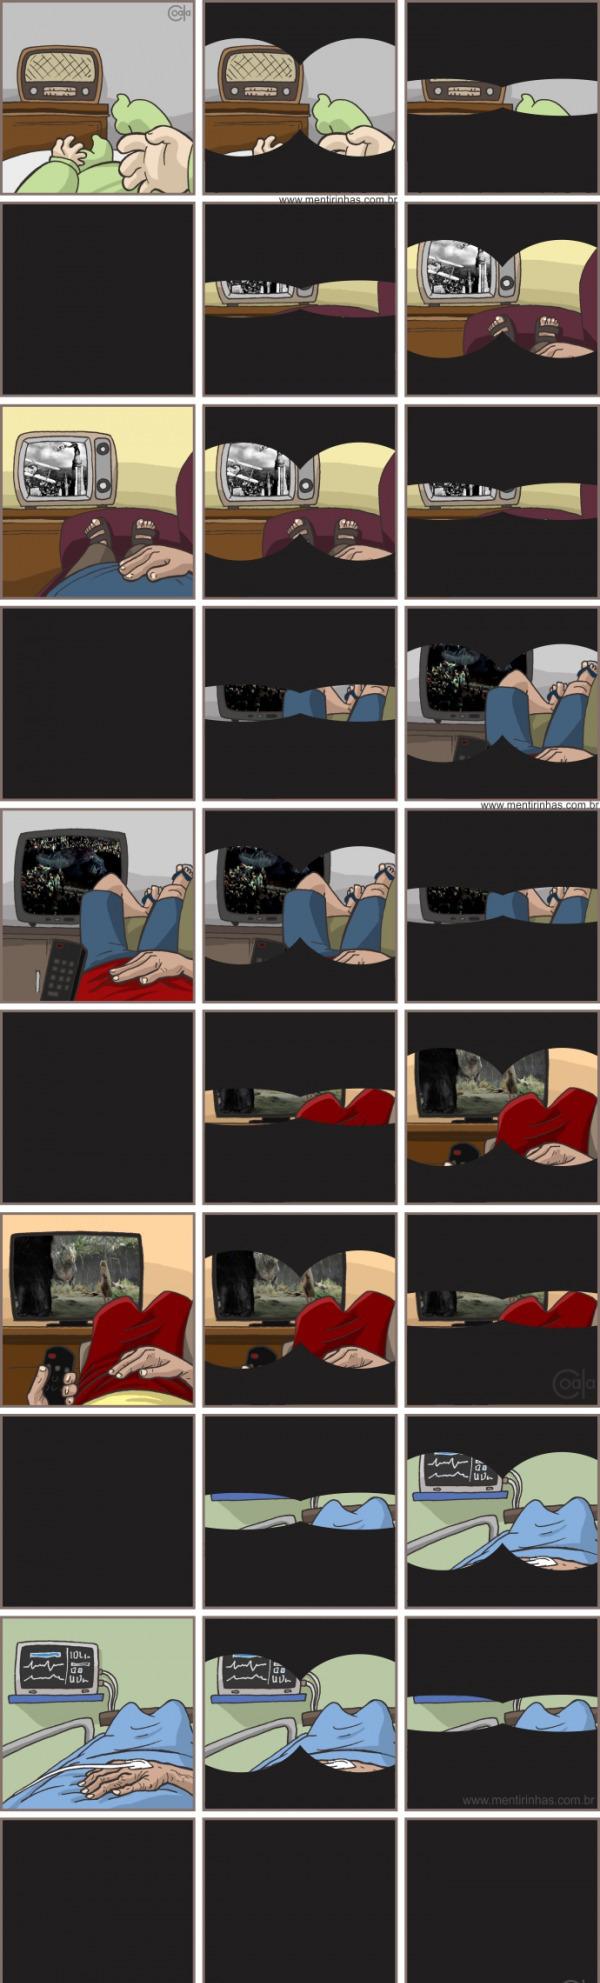 Смешные комиксы BroDude.ru smeshnie komiksi 1454543685